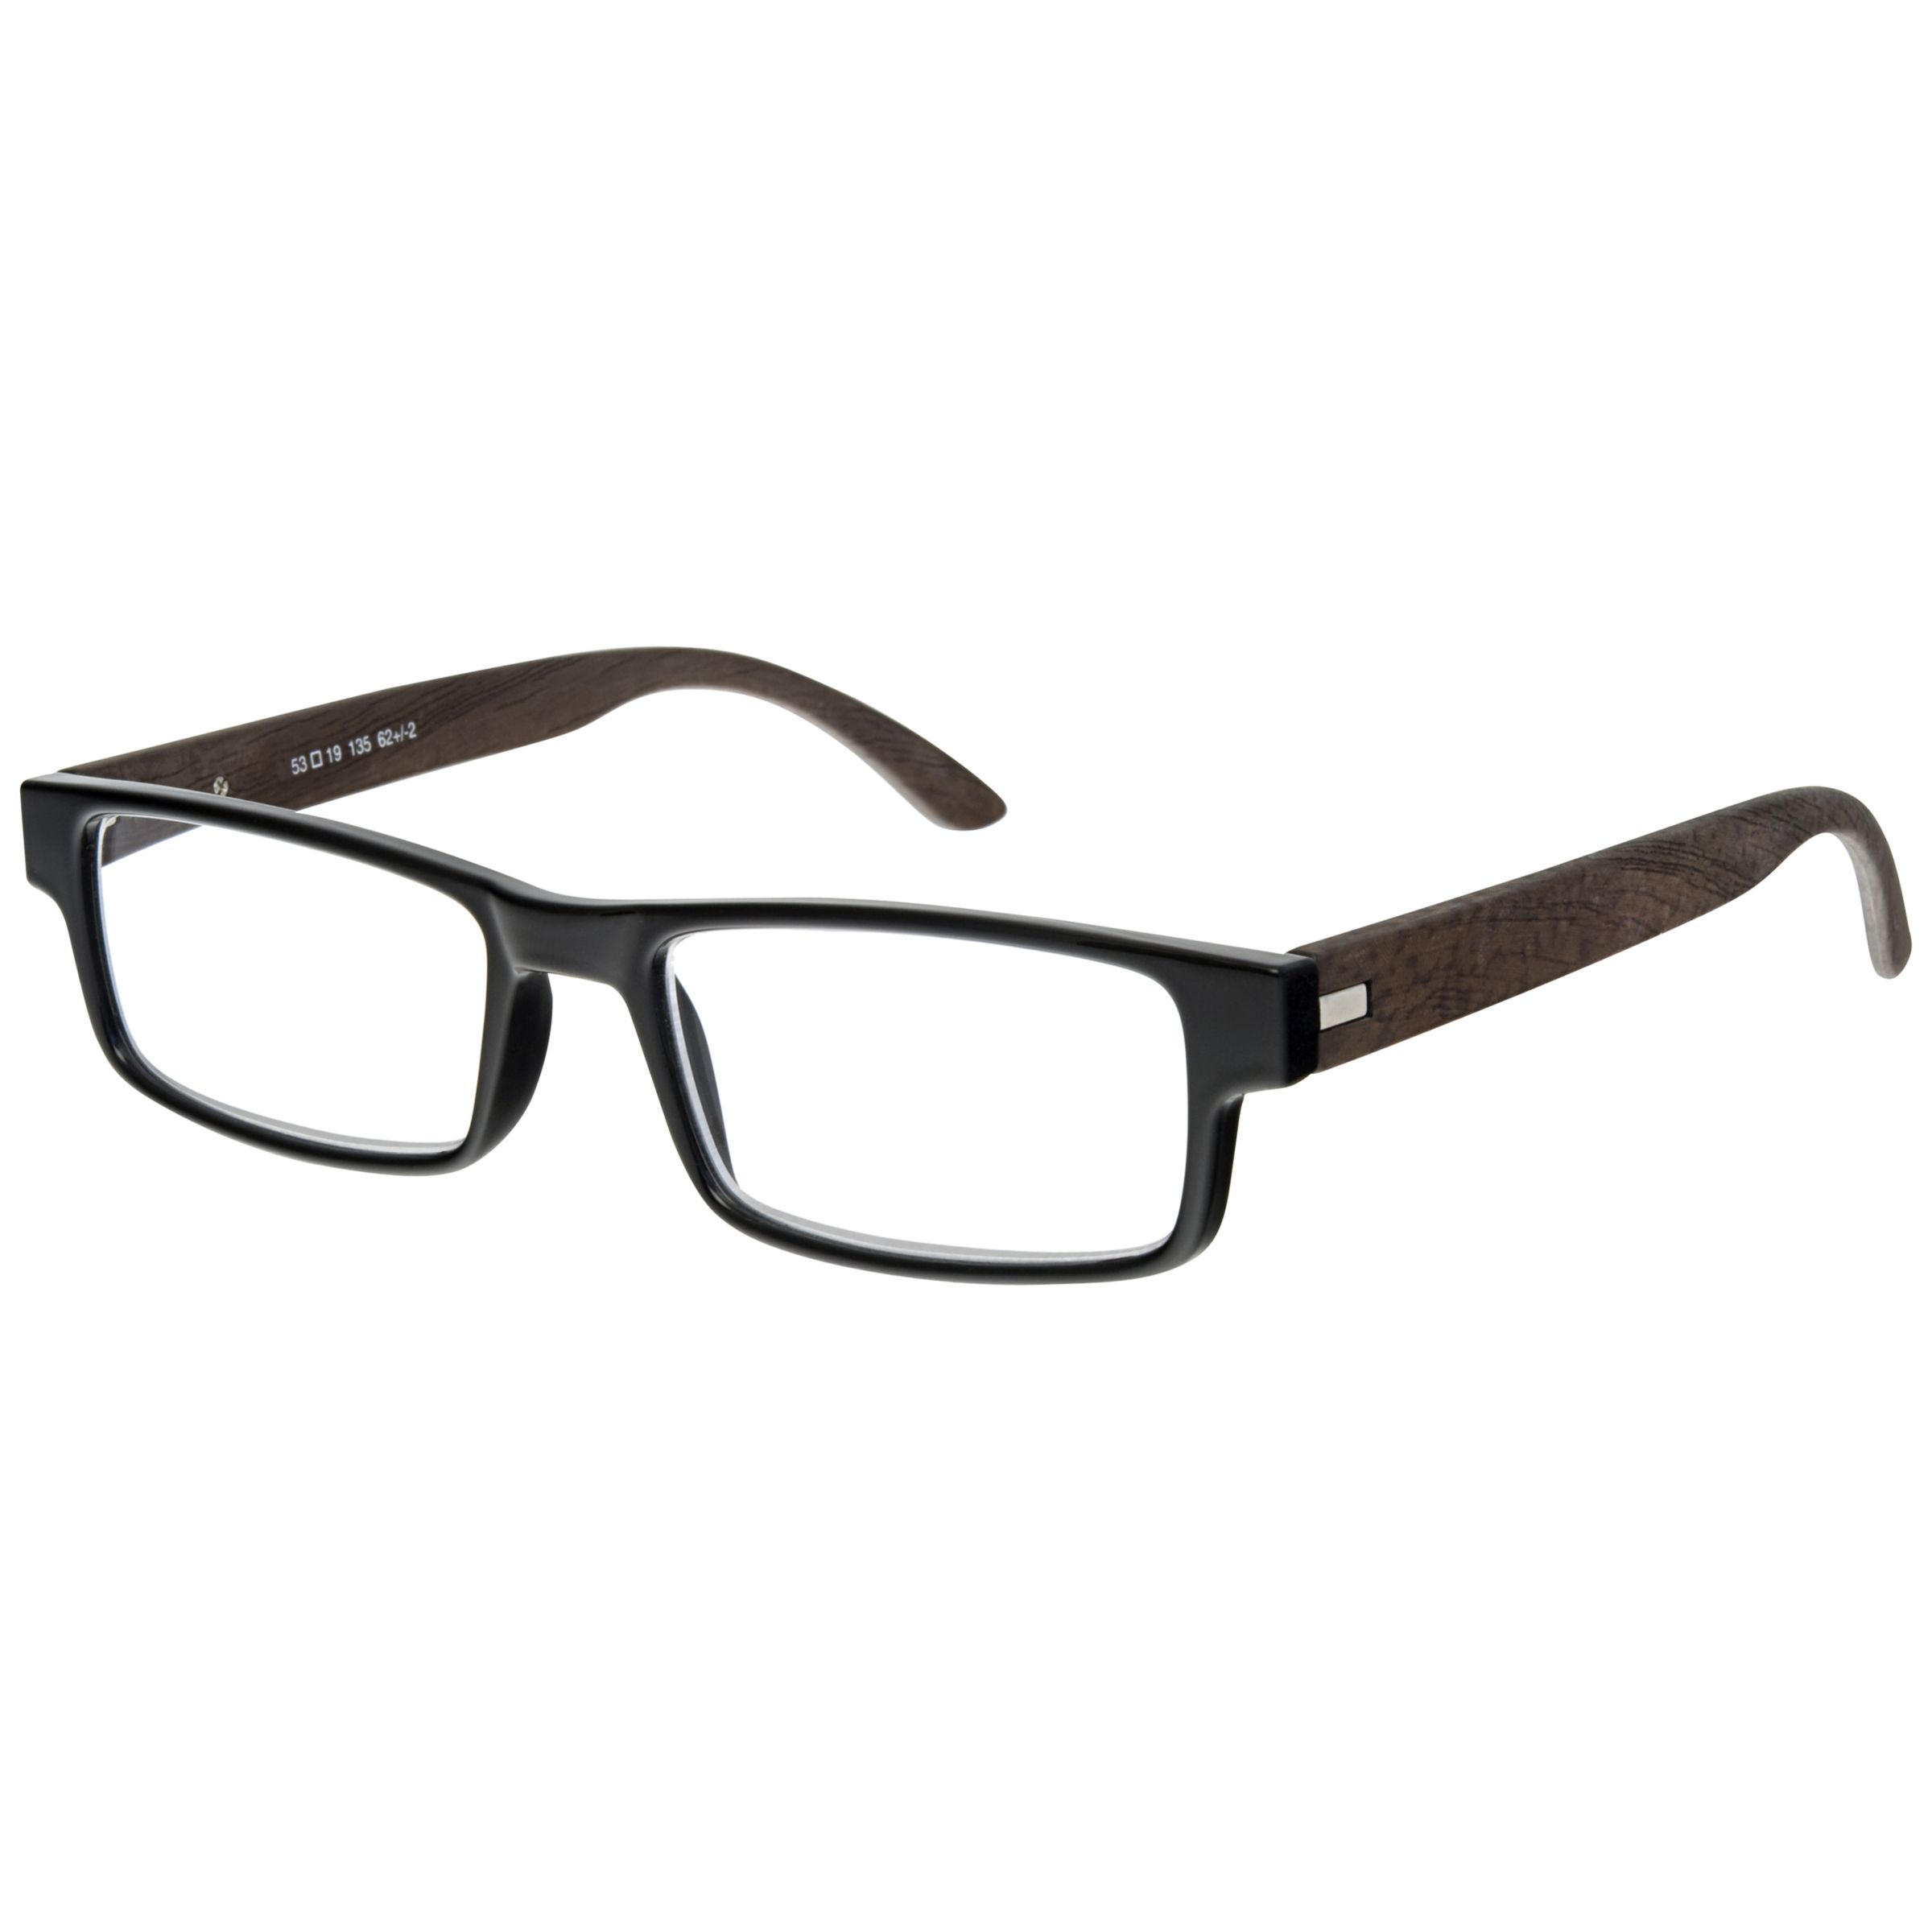 Magnif Eyes Magnif Eyes Unisex Ready Readers Oakland Glasses, Ebony